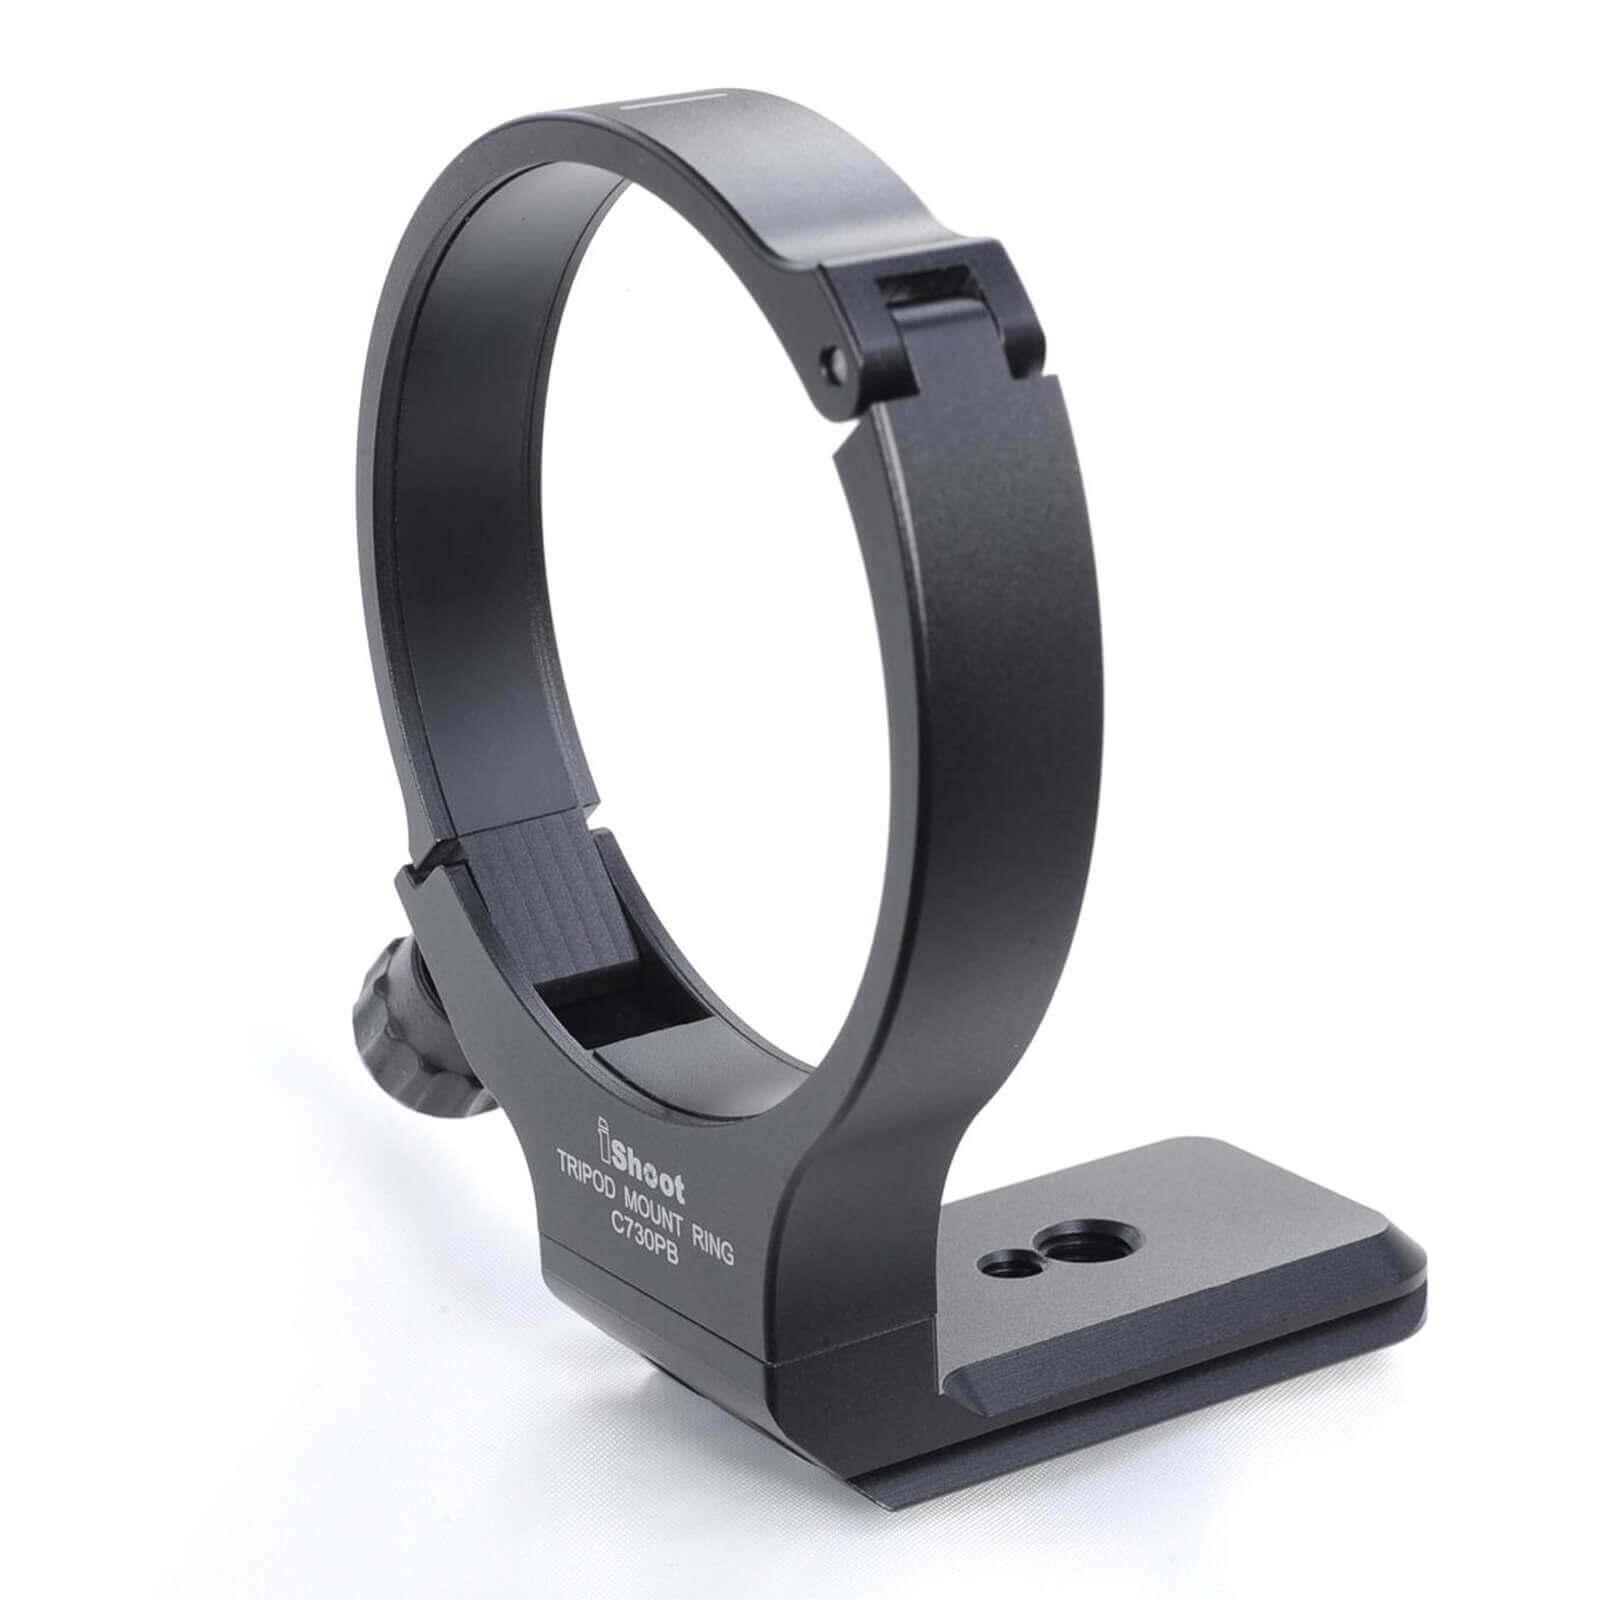 80mm Tripod Mount Ring Lens Collar for Canon EF 28-300mm f/3.5-5.6L IS USM Lens